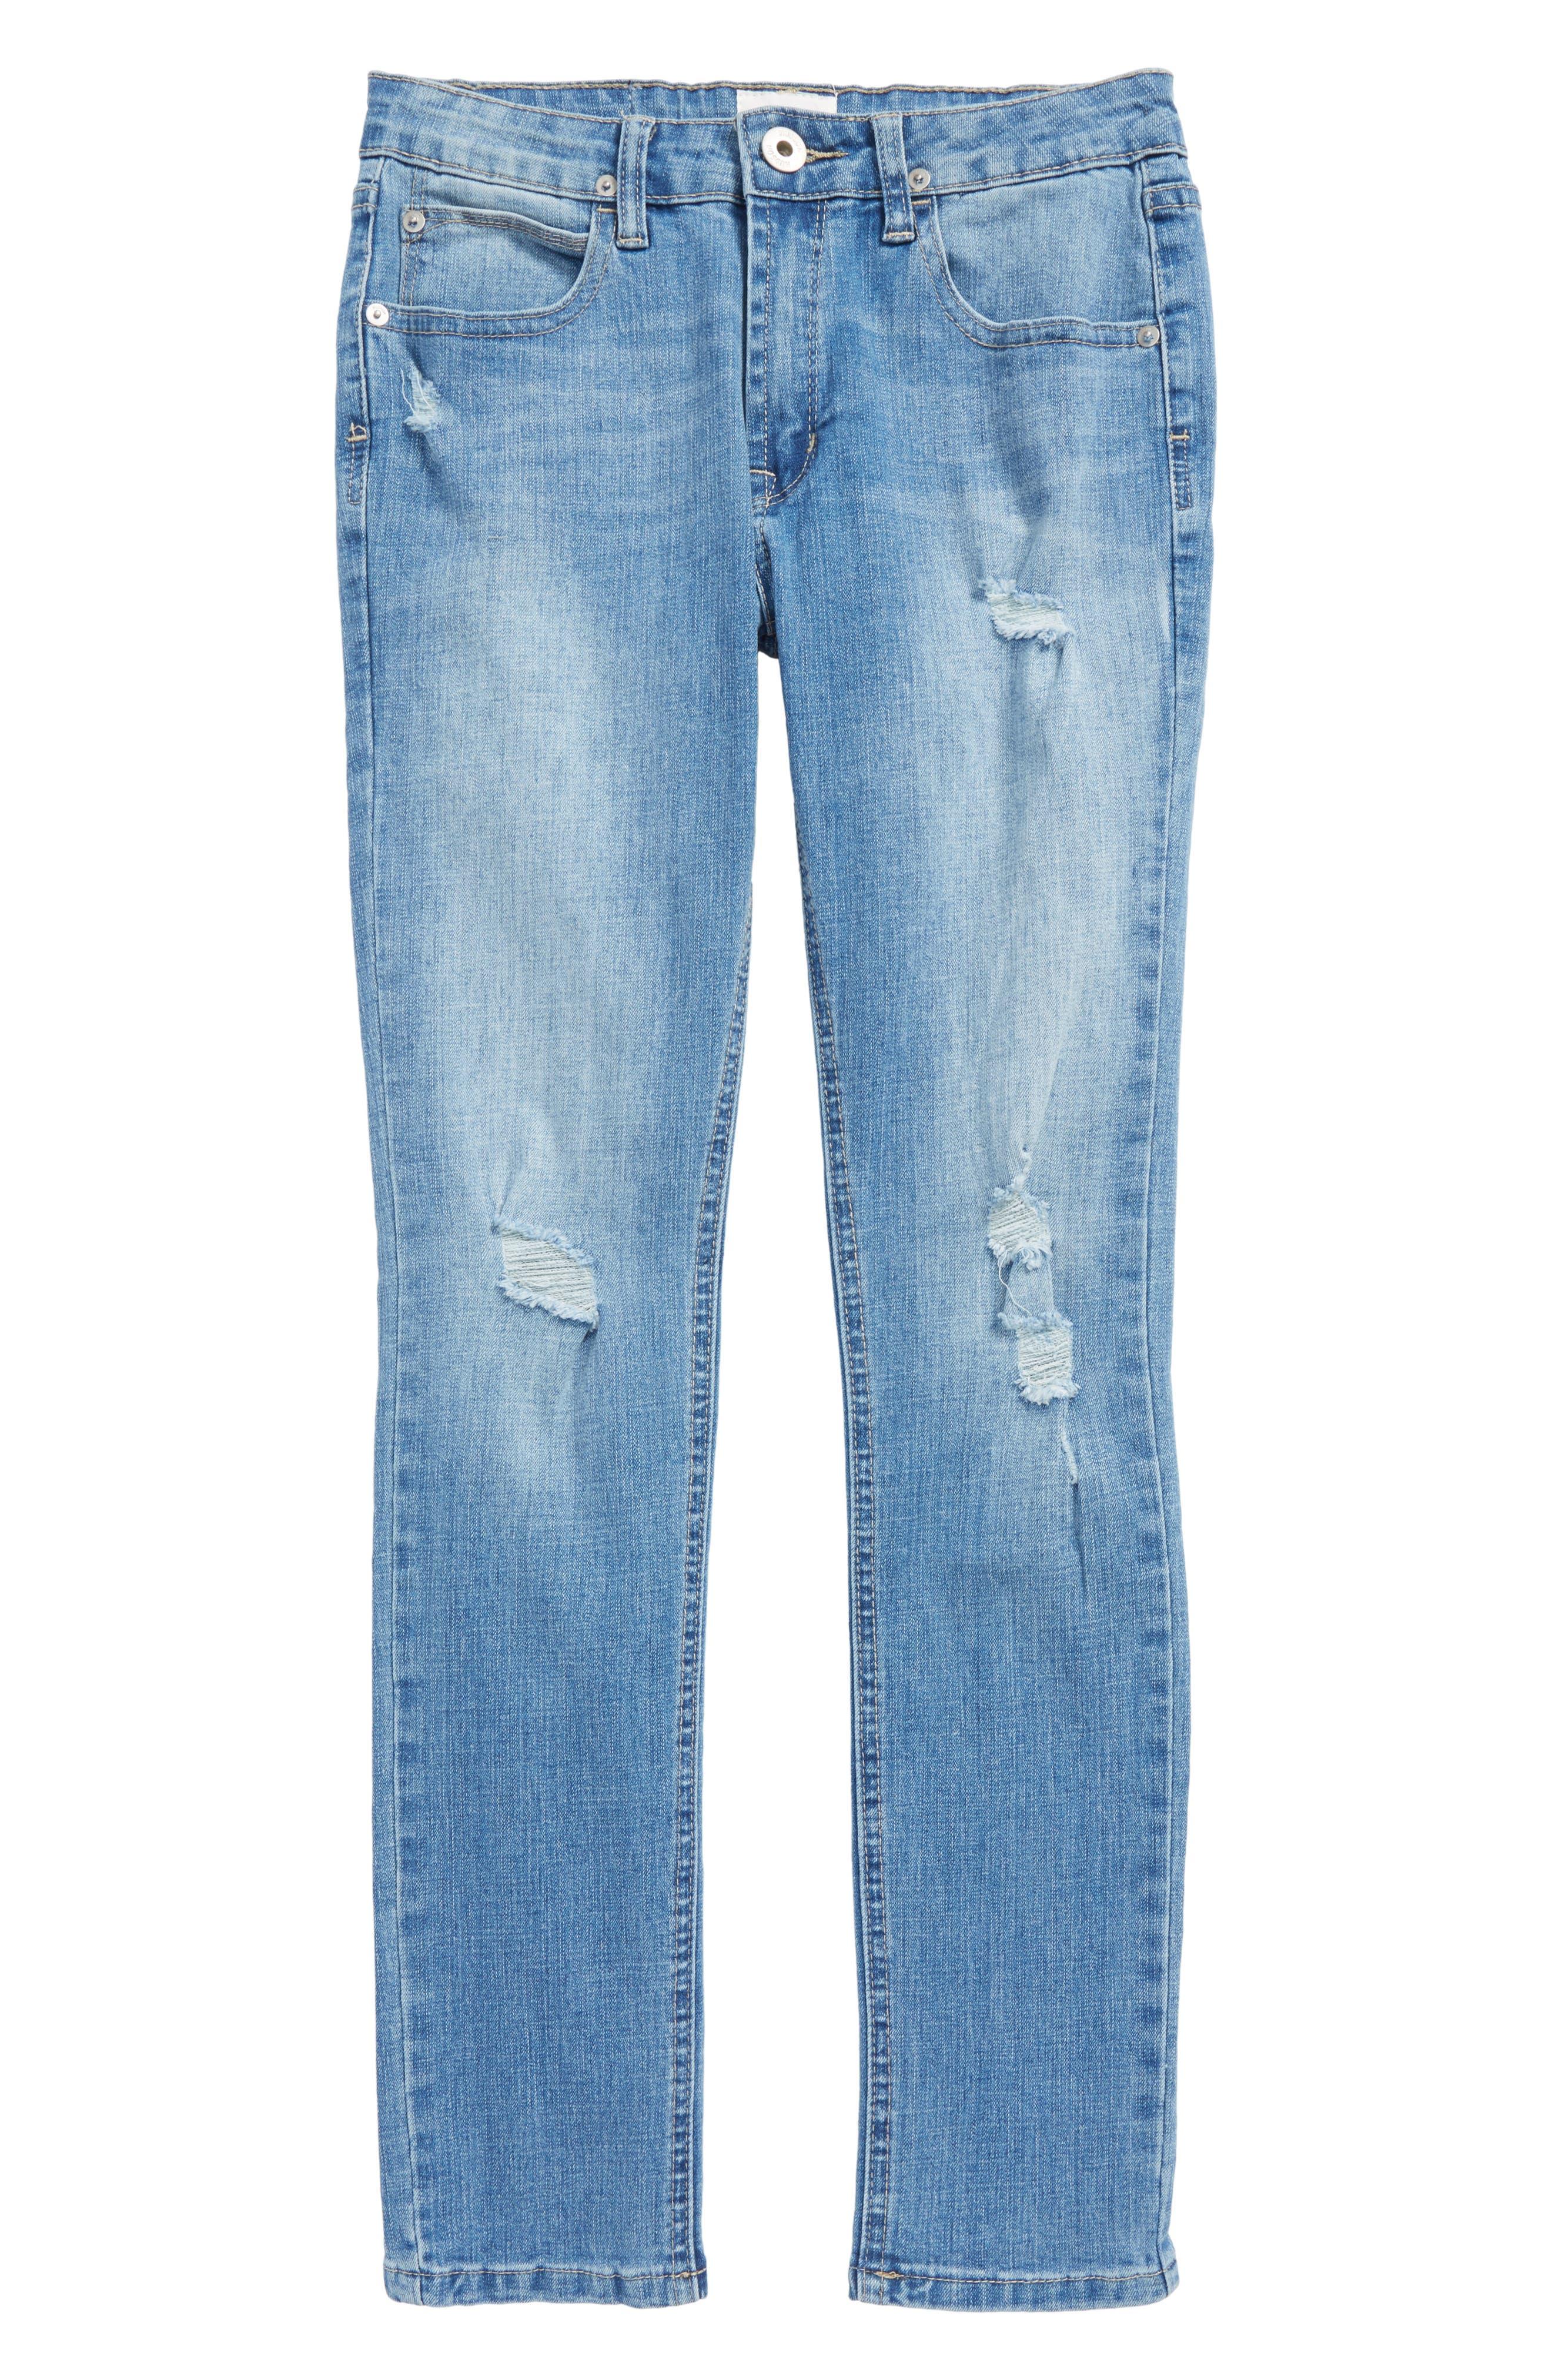 Jude Skinny Jeans,                             Main thumbnail 1, color,                             465